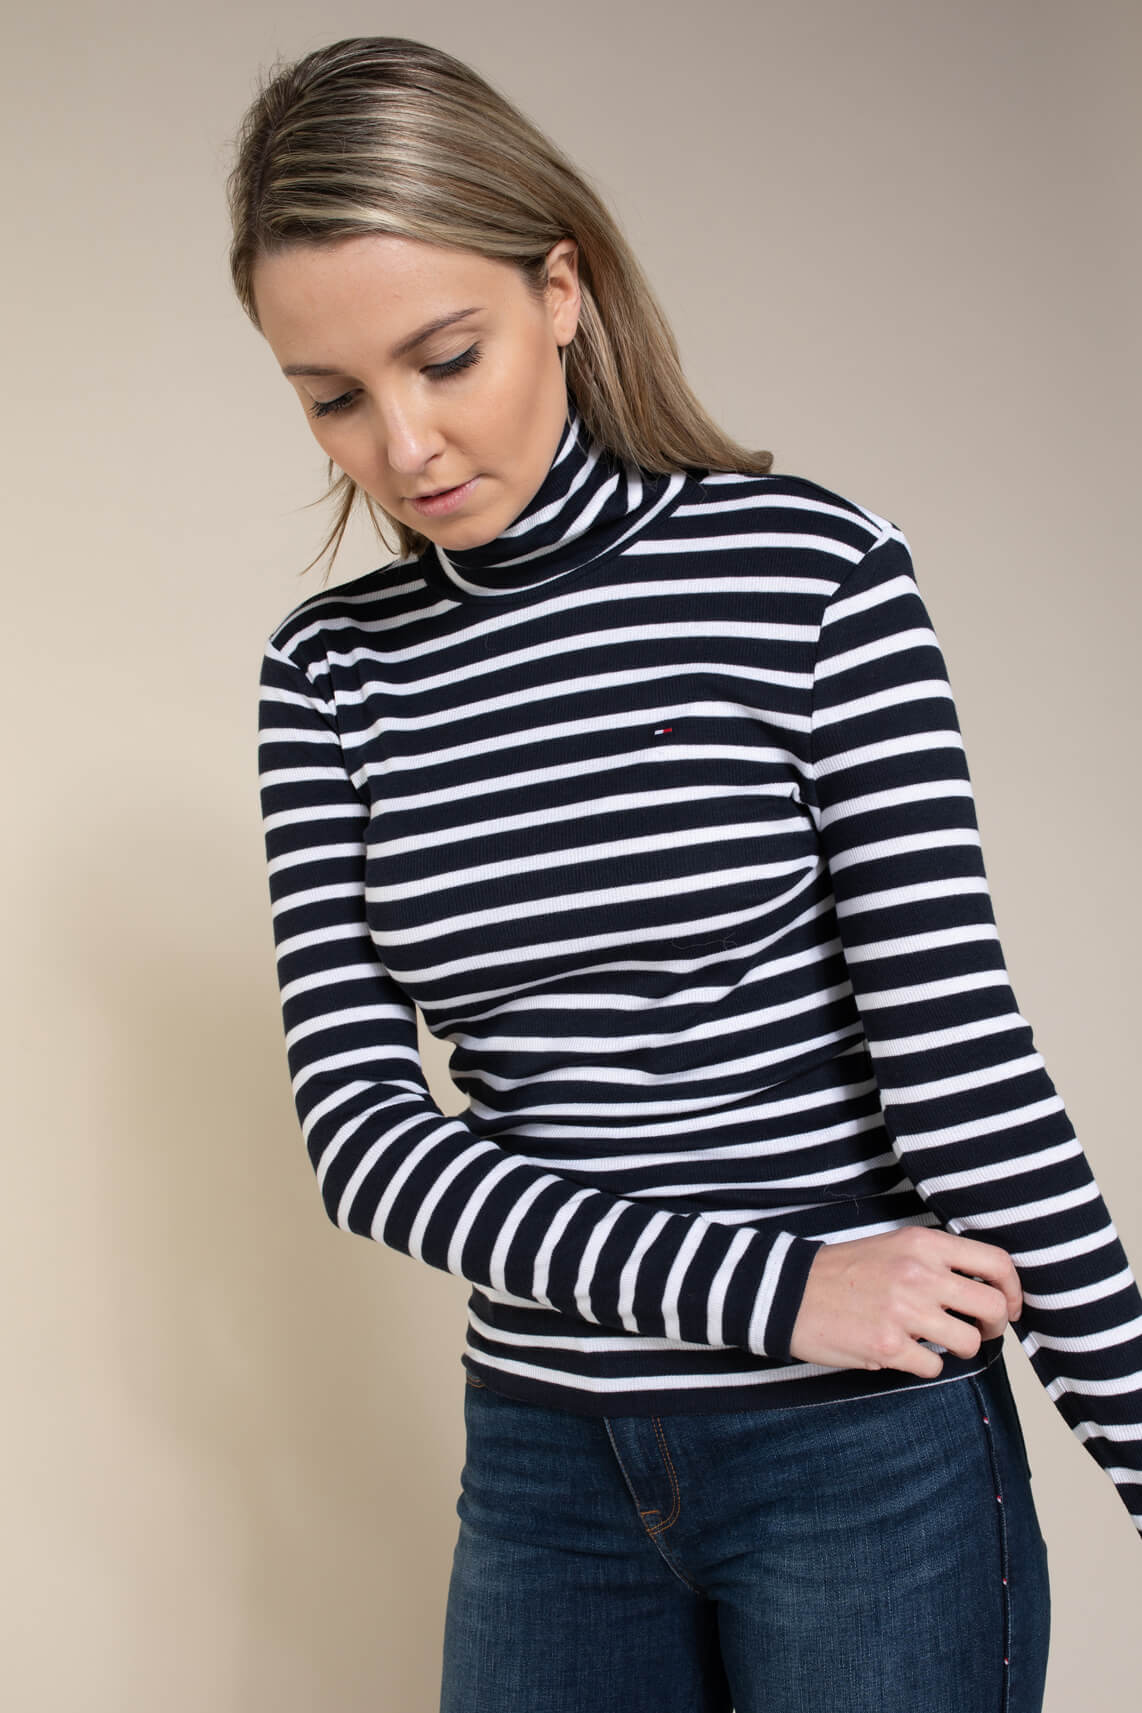 Tommy Hilfiger Dames Shirt met strepen Blauw